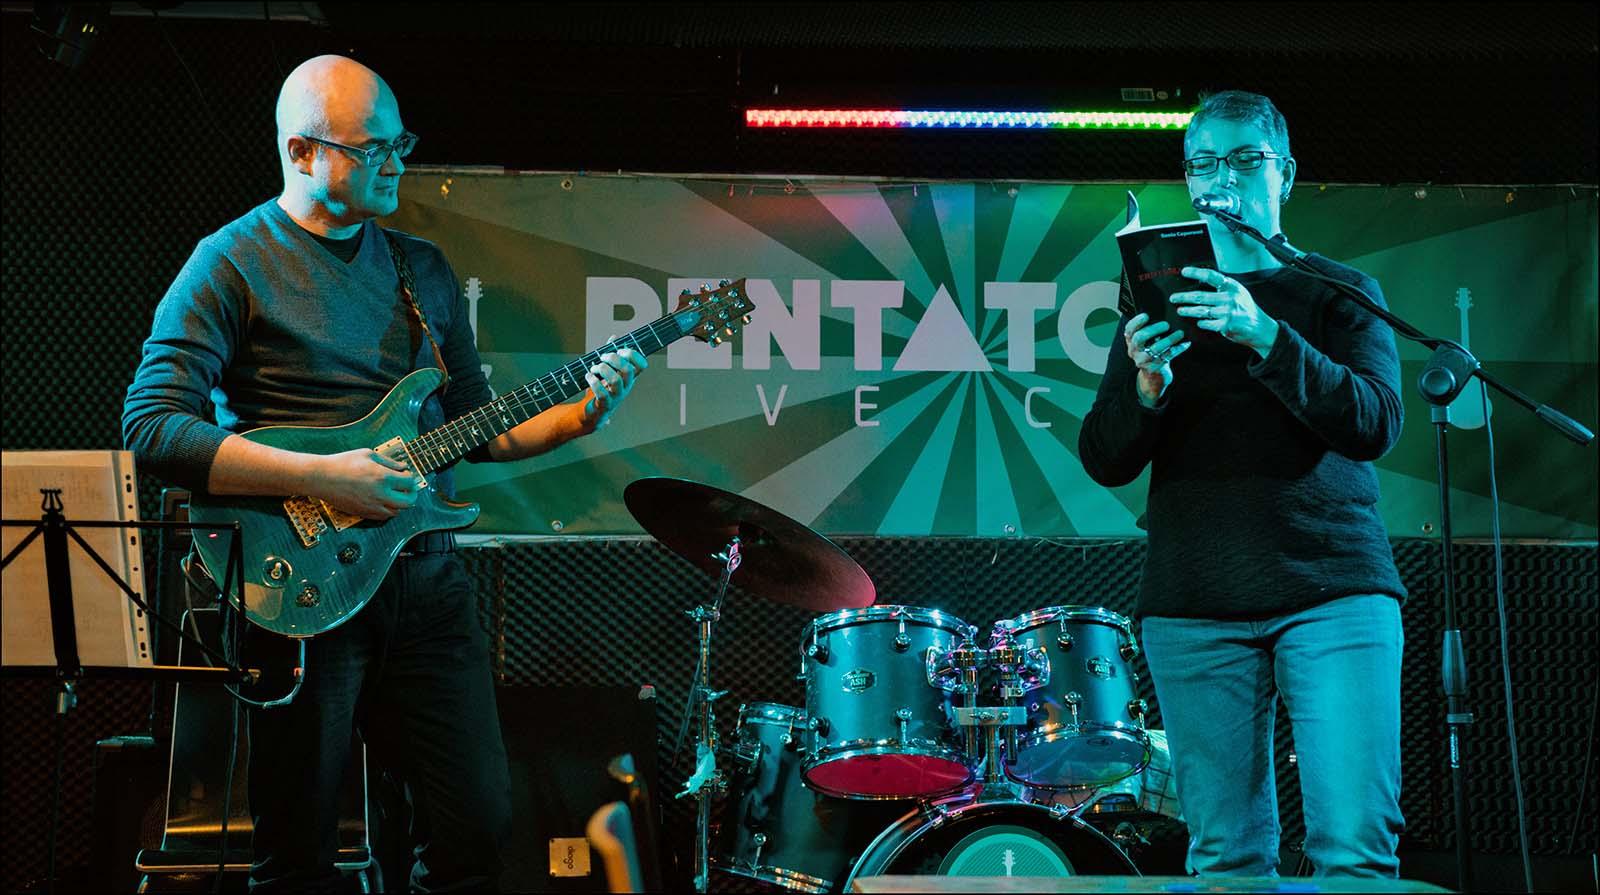 15/12/2016, "Erotomaculae" al Pentatonic. Foto di Dino Ignani